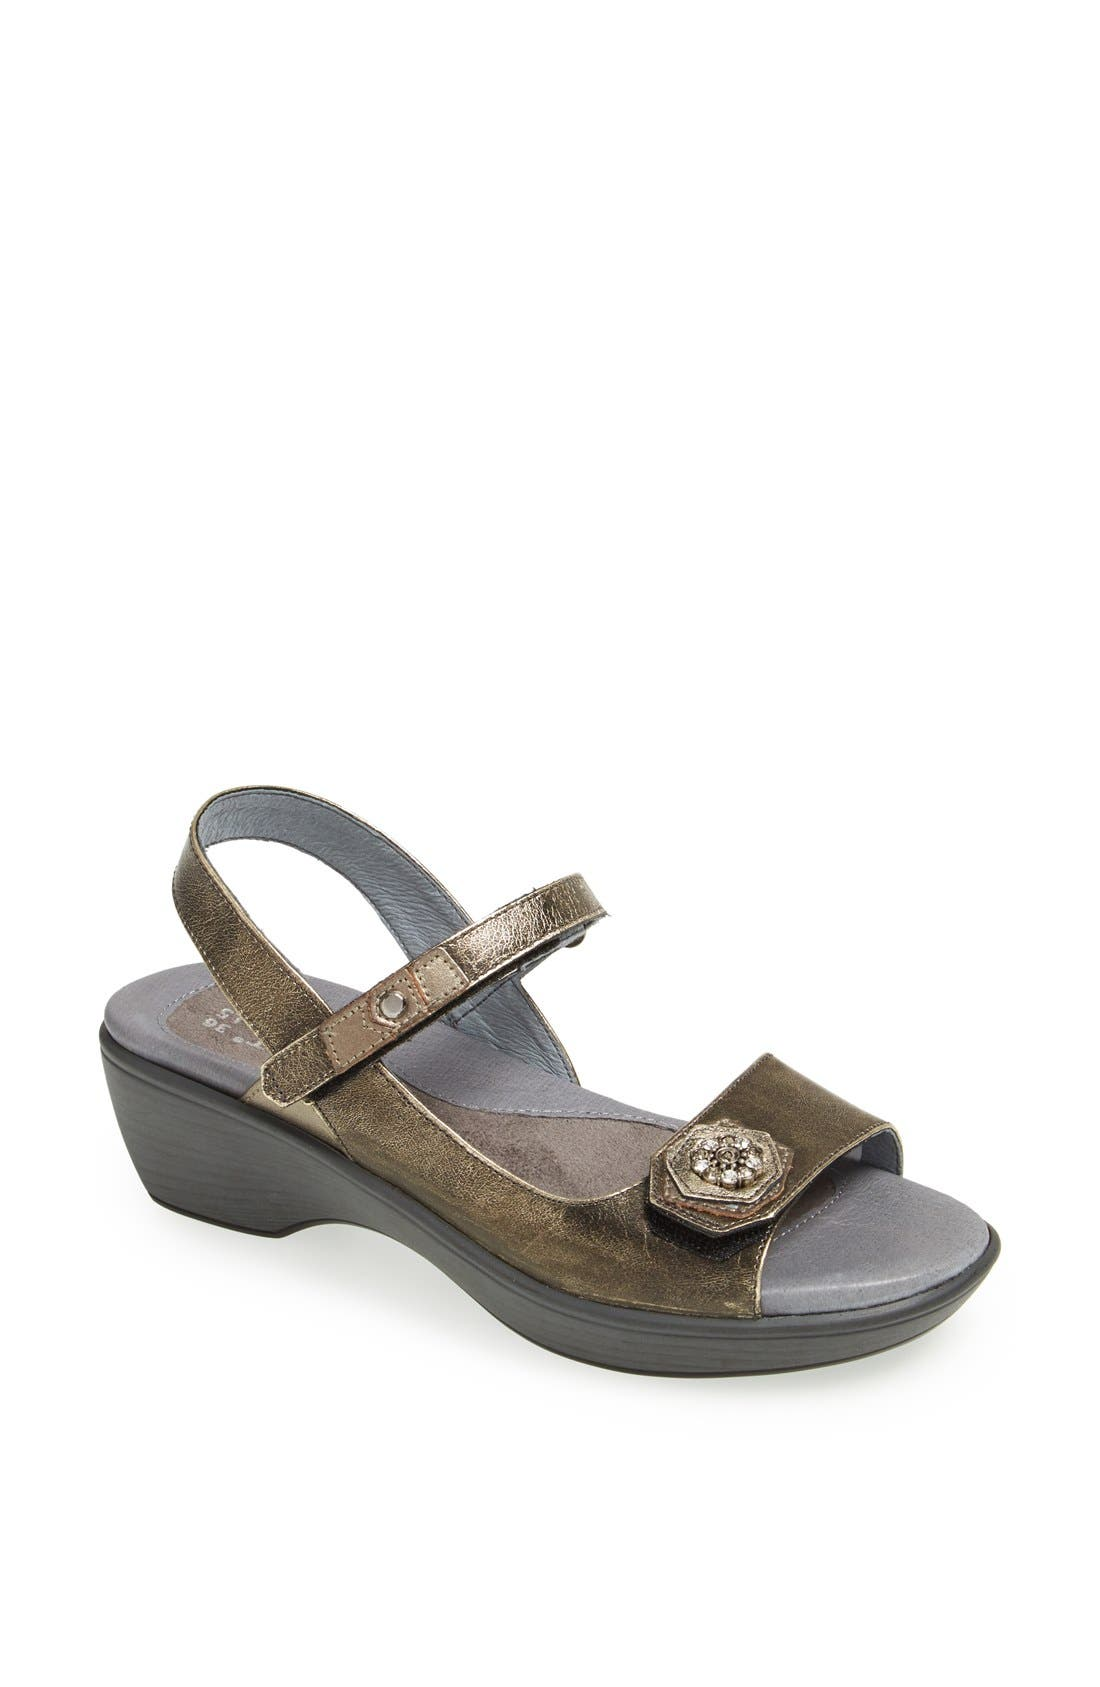 Naot 'Reserve' Sandal